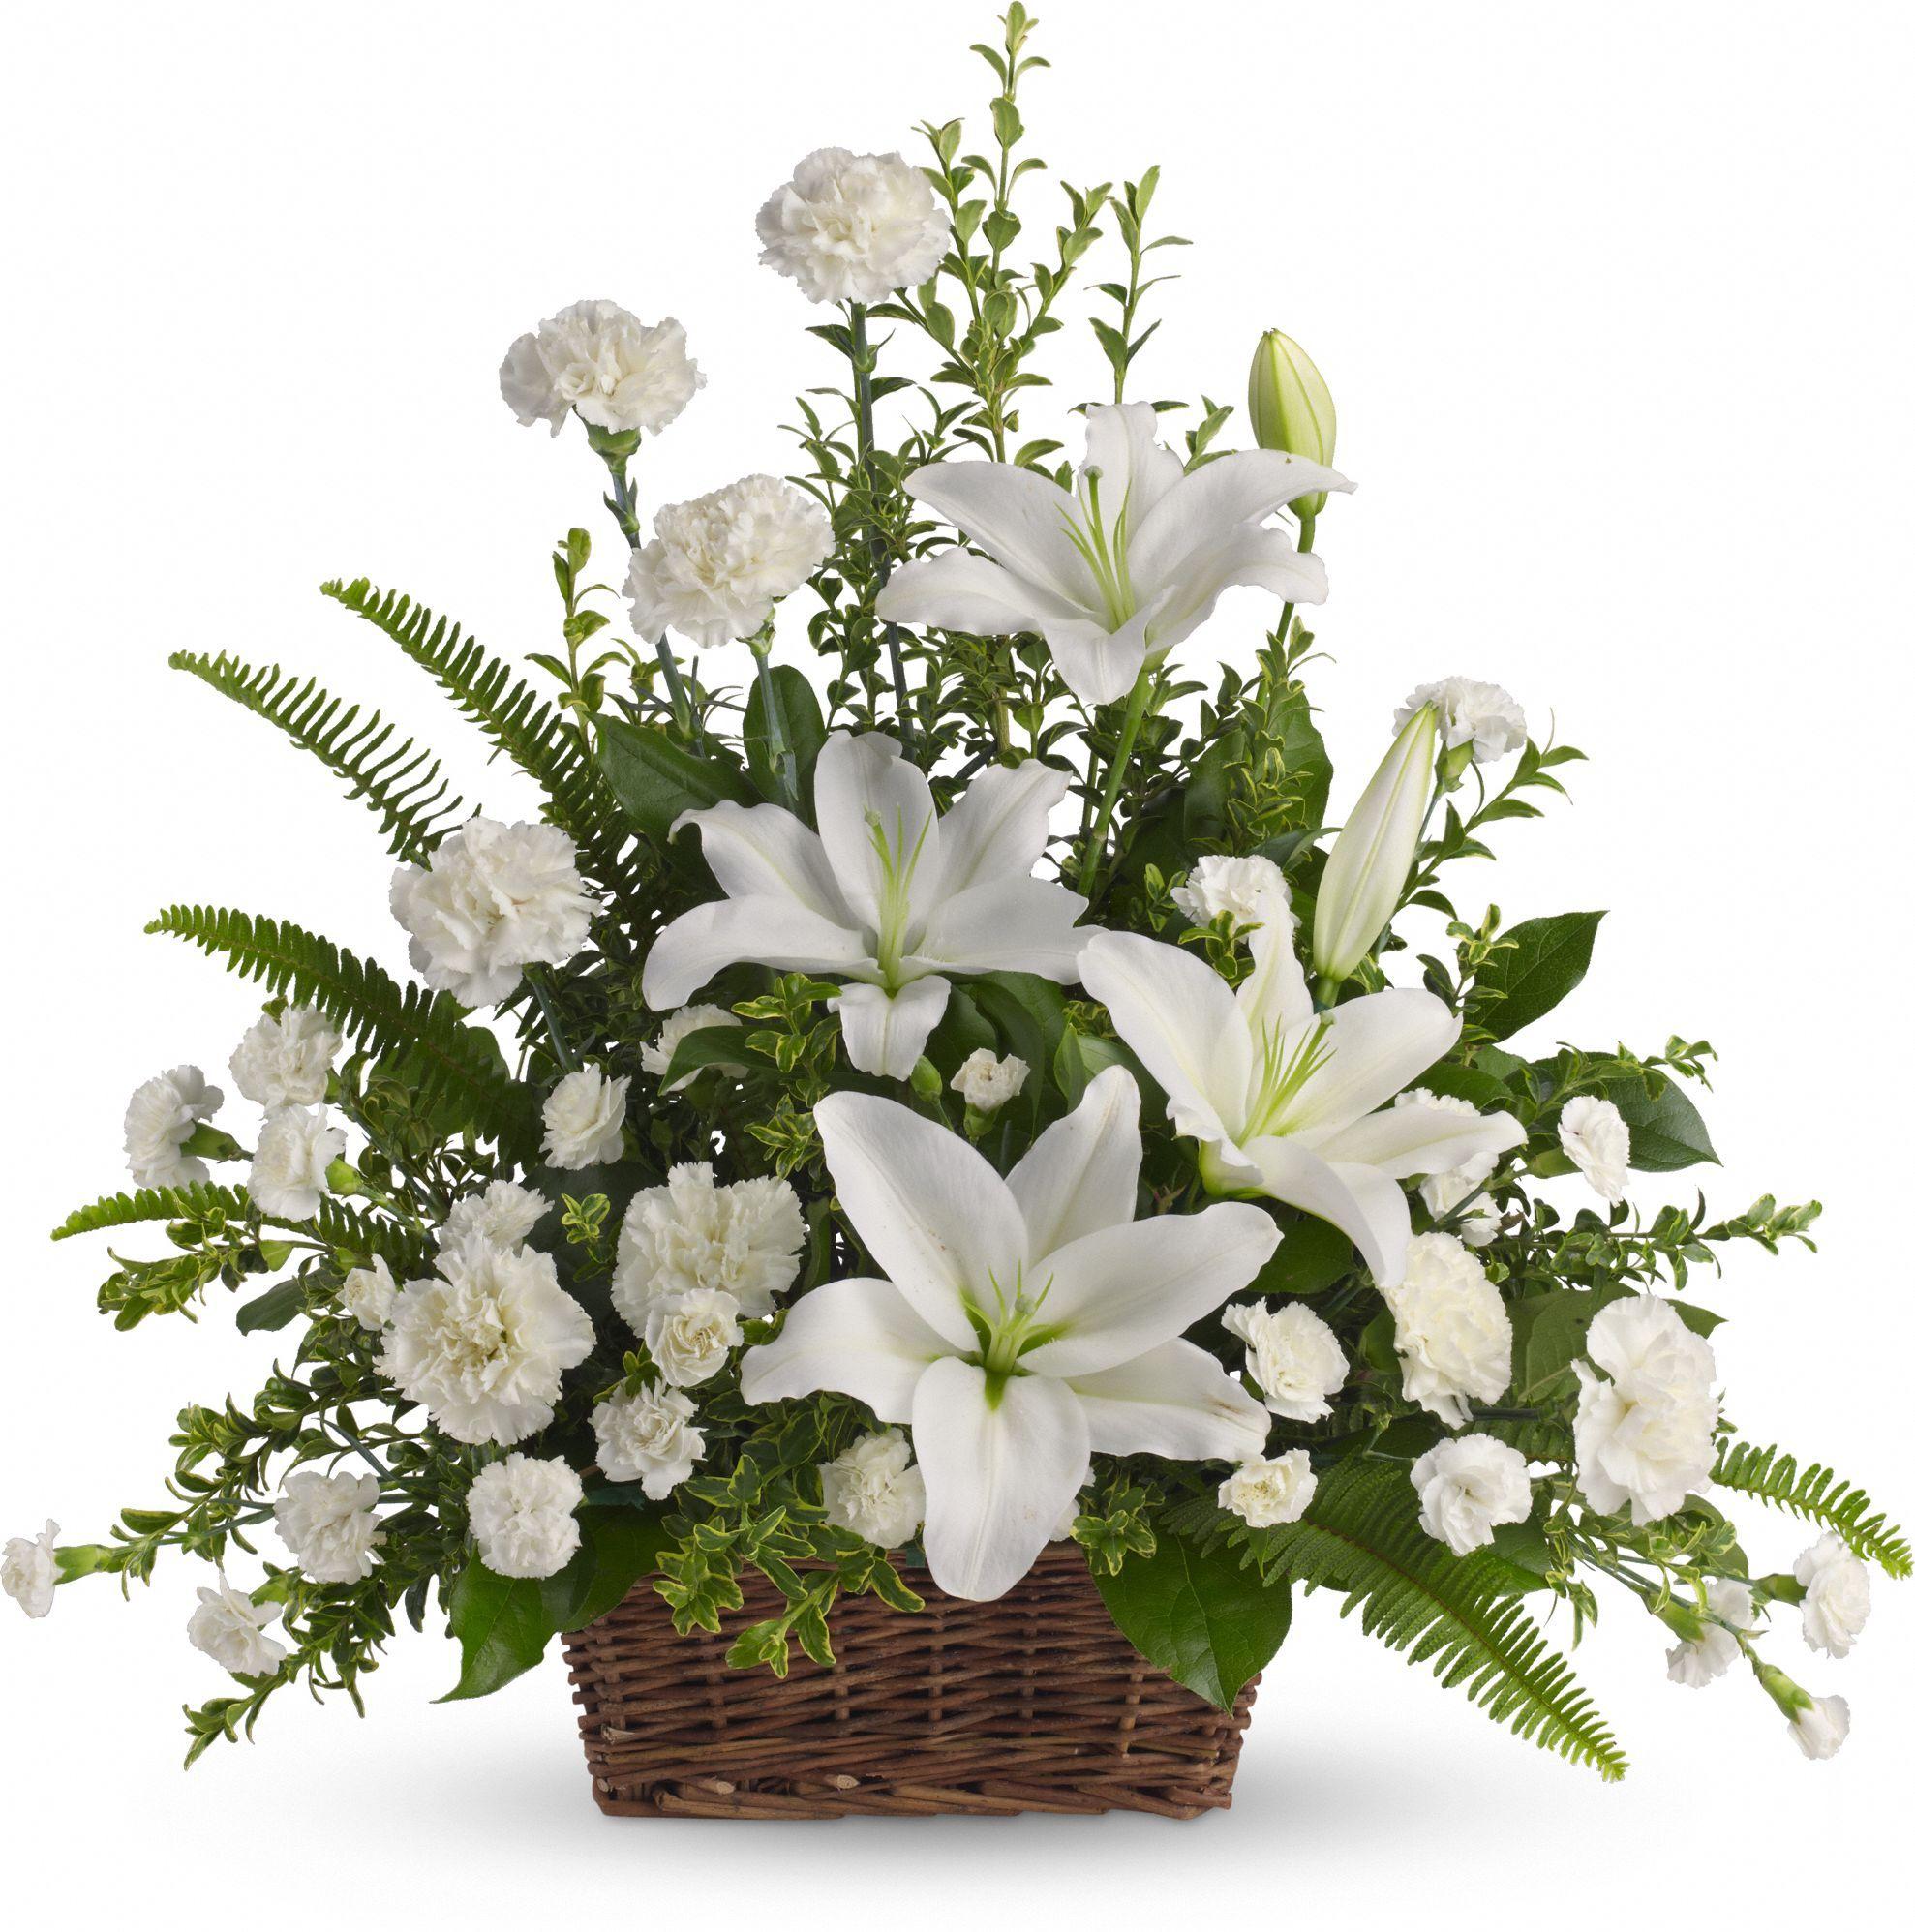 Peaceful White Lilies Basket Very pretty Flower arrangements